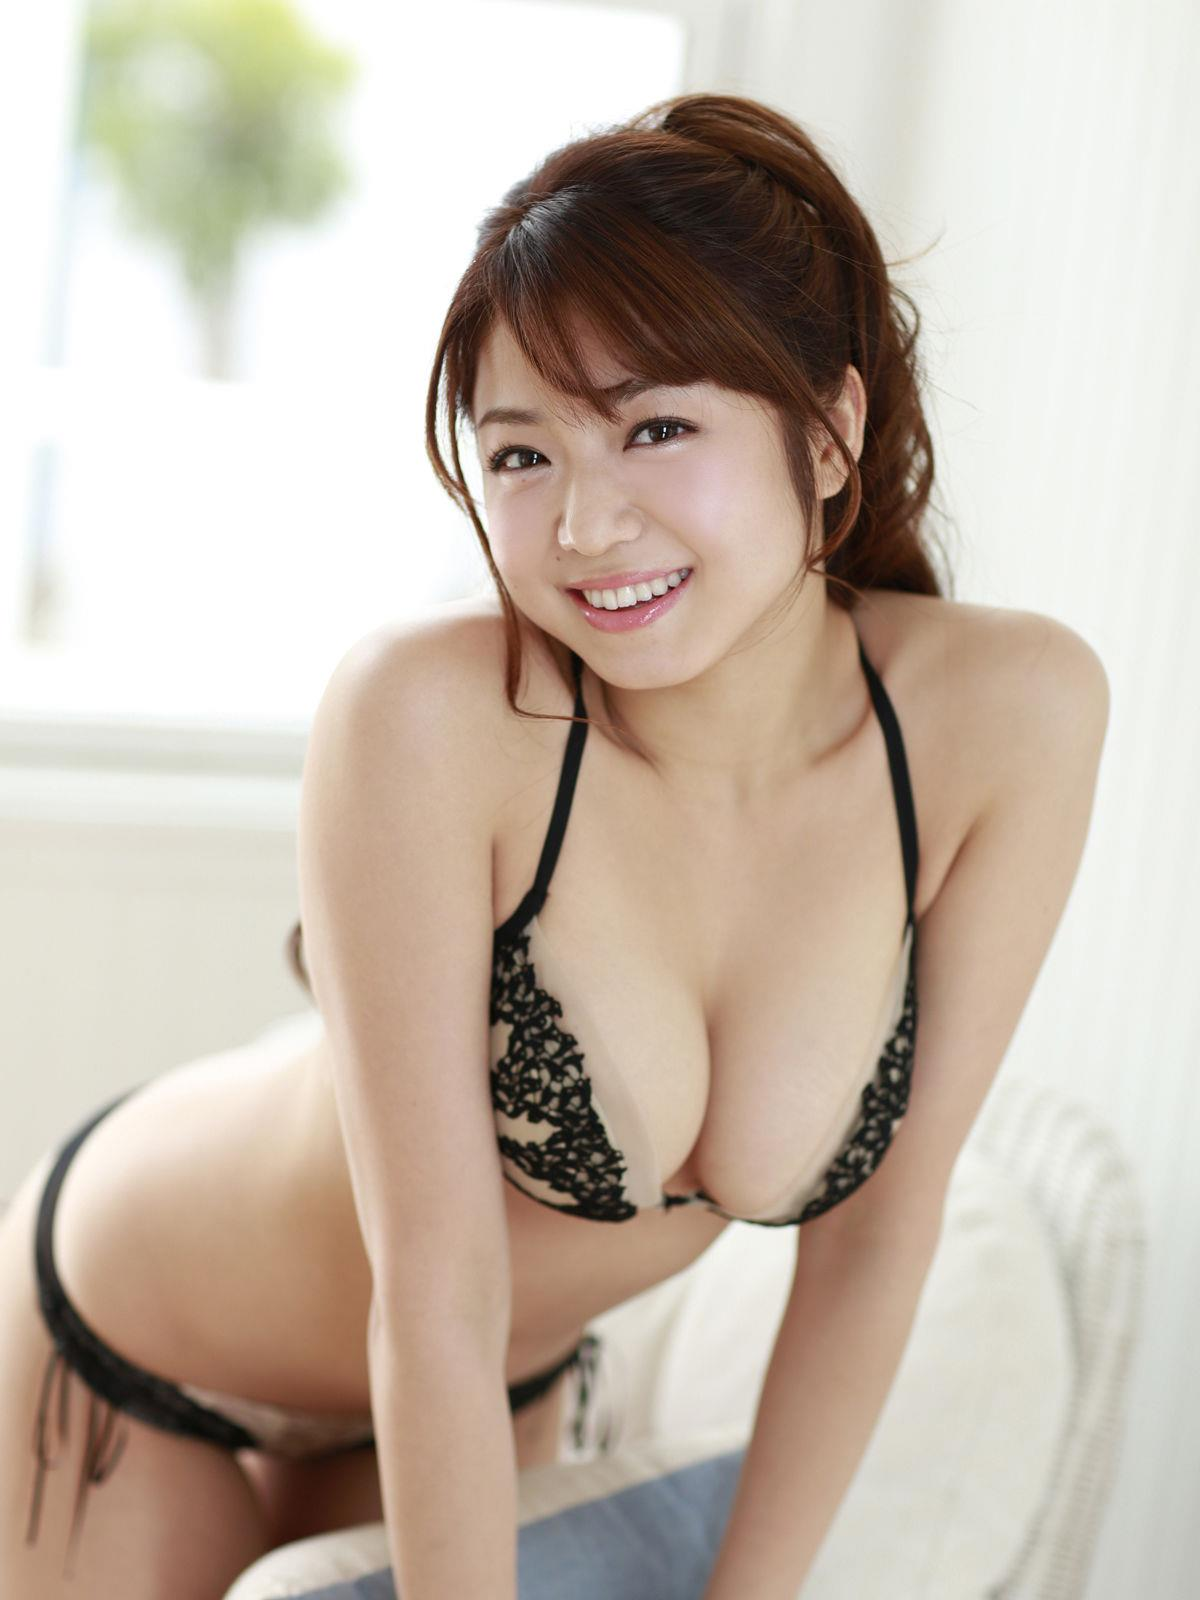 中村静香 画像 50